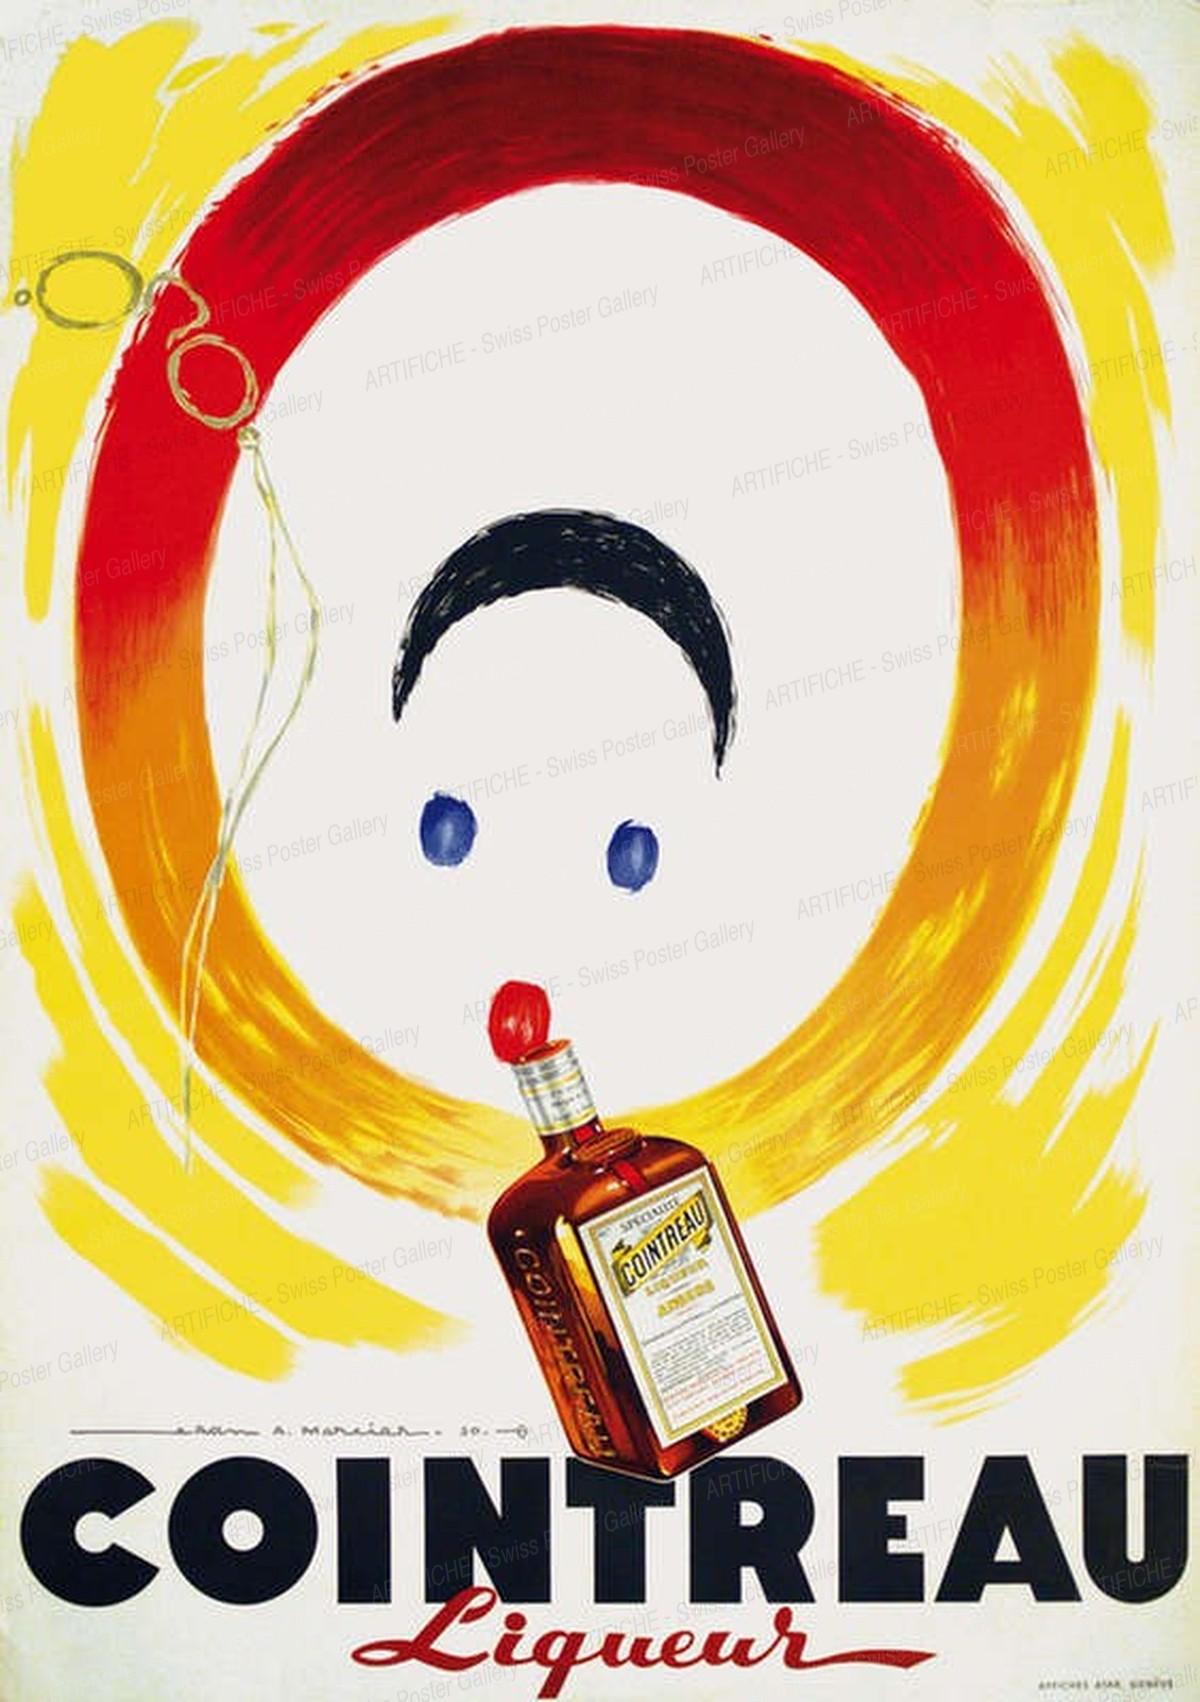 Cointreau Liqueur, Jean Mercier